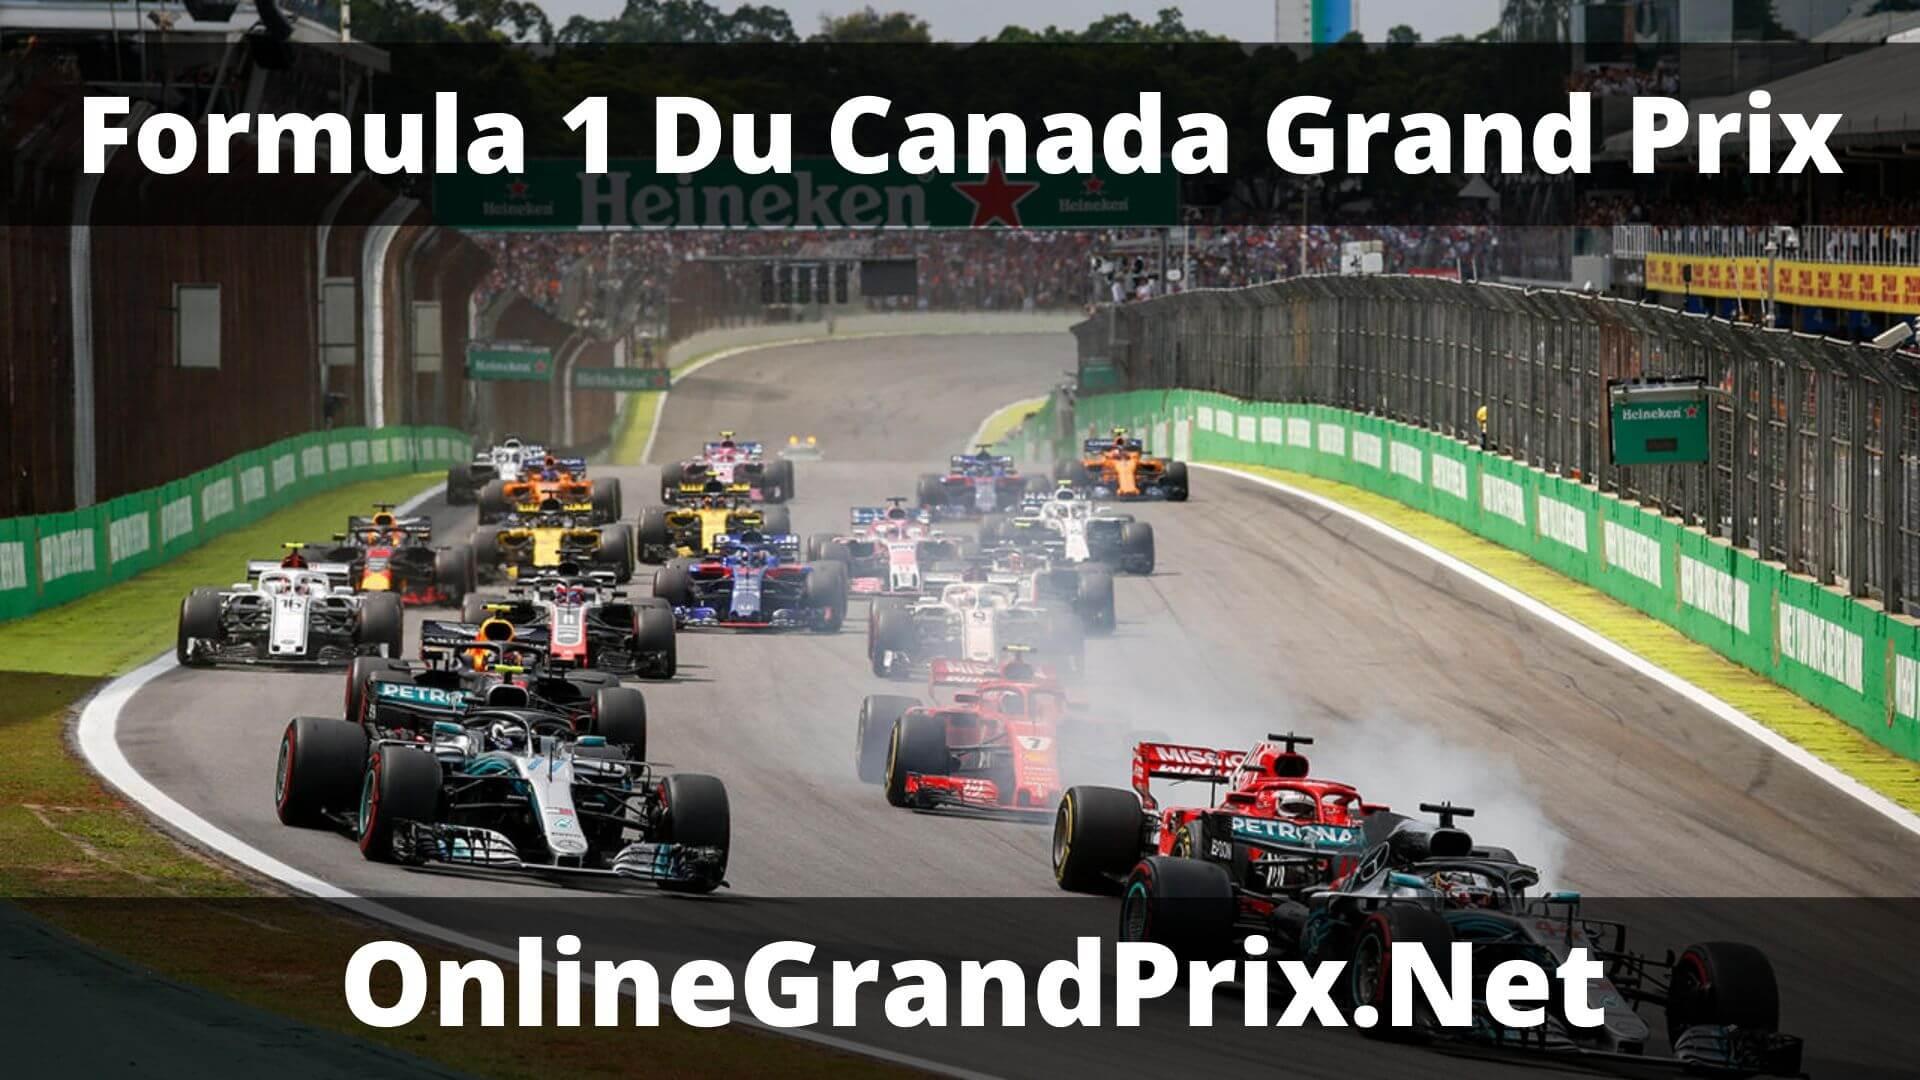 F1 Practice 1 Du Canada GP Live Stream 2020